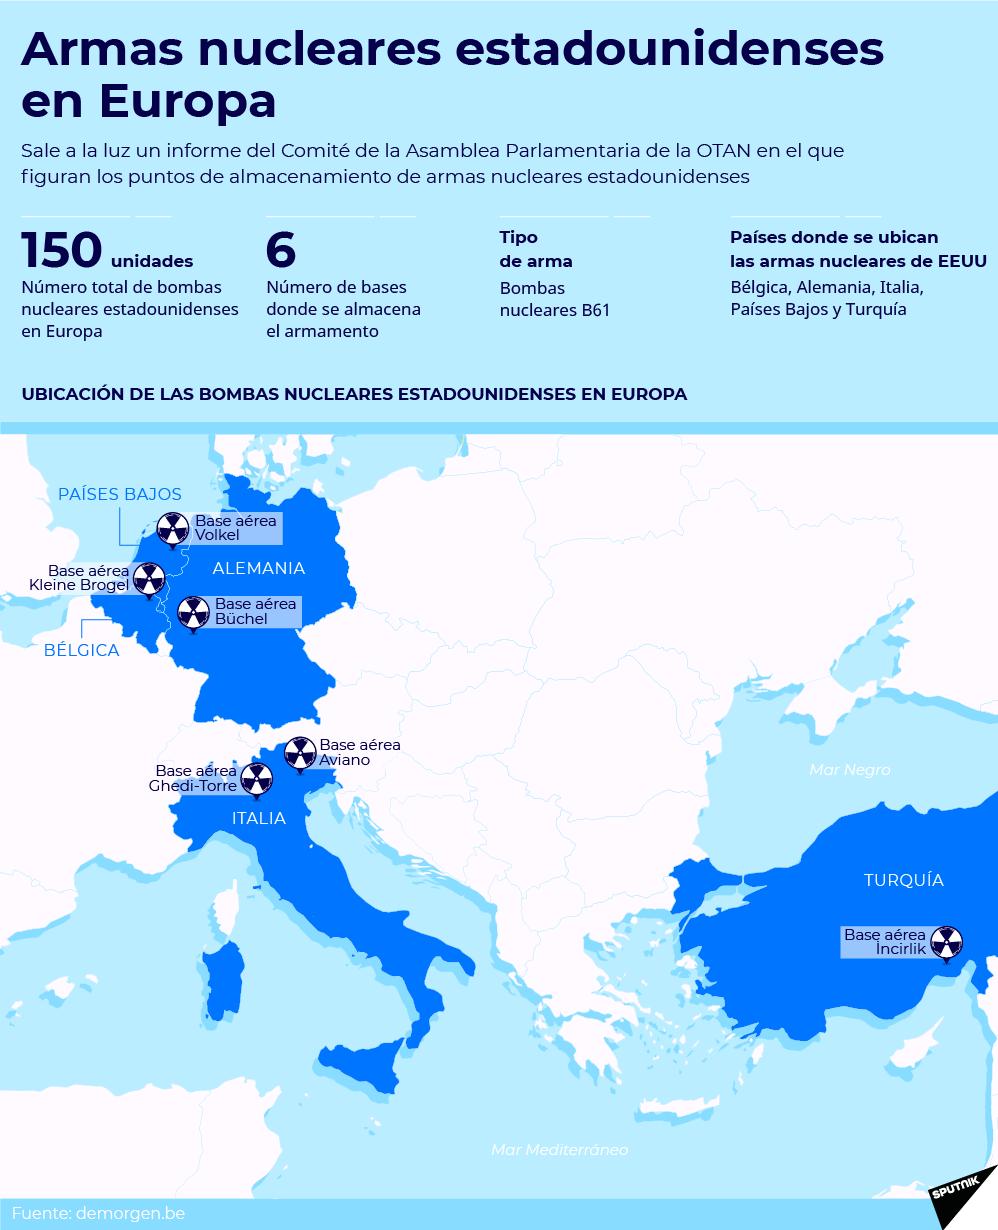 Distribución de bombas nucleares de EEUU en Europa